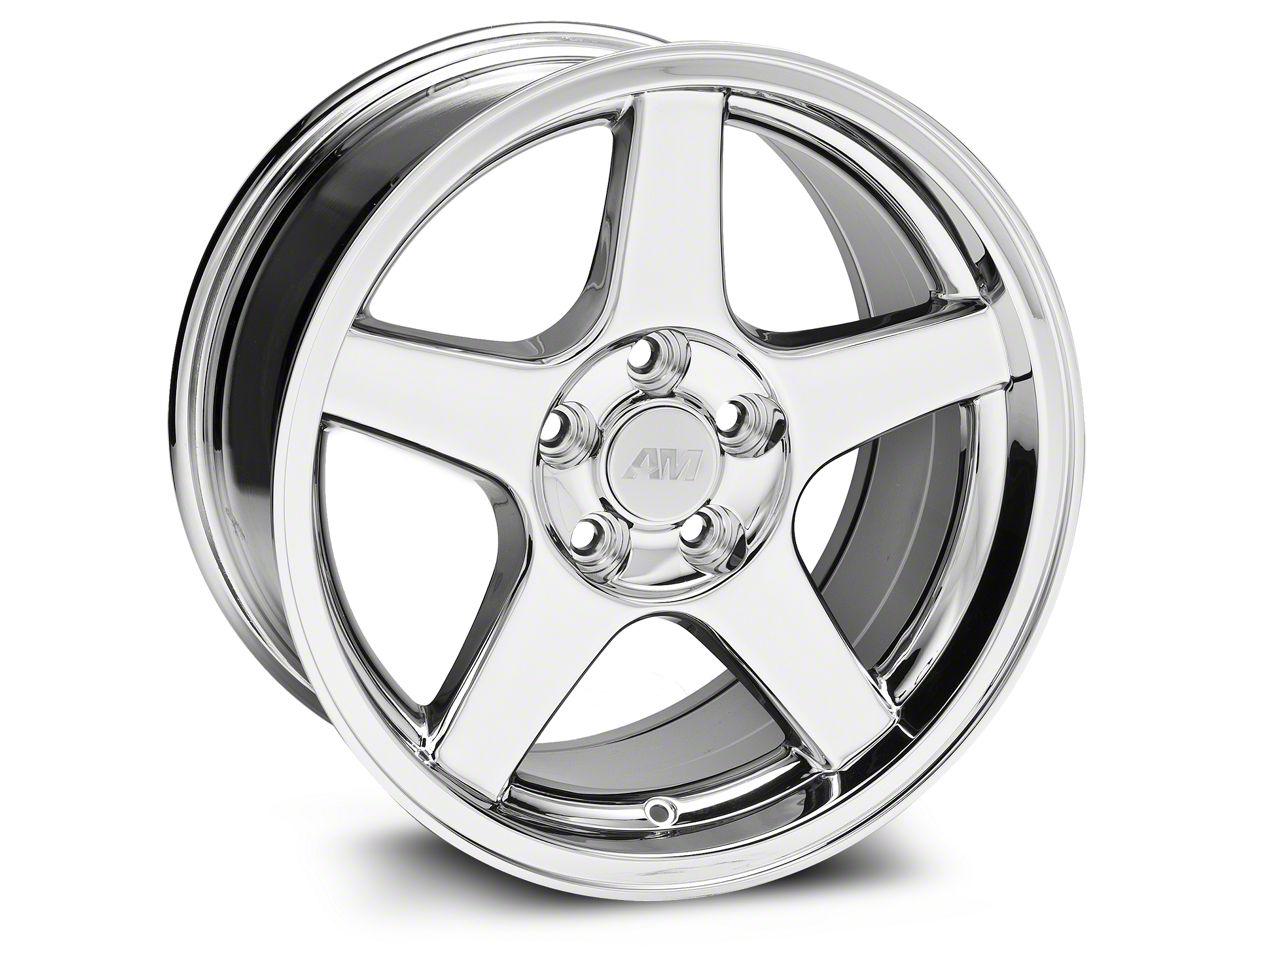 cobra style mustang wheels americanmuscle F150 Halo Headlights mustang cobra wheels